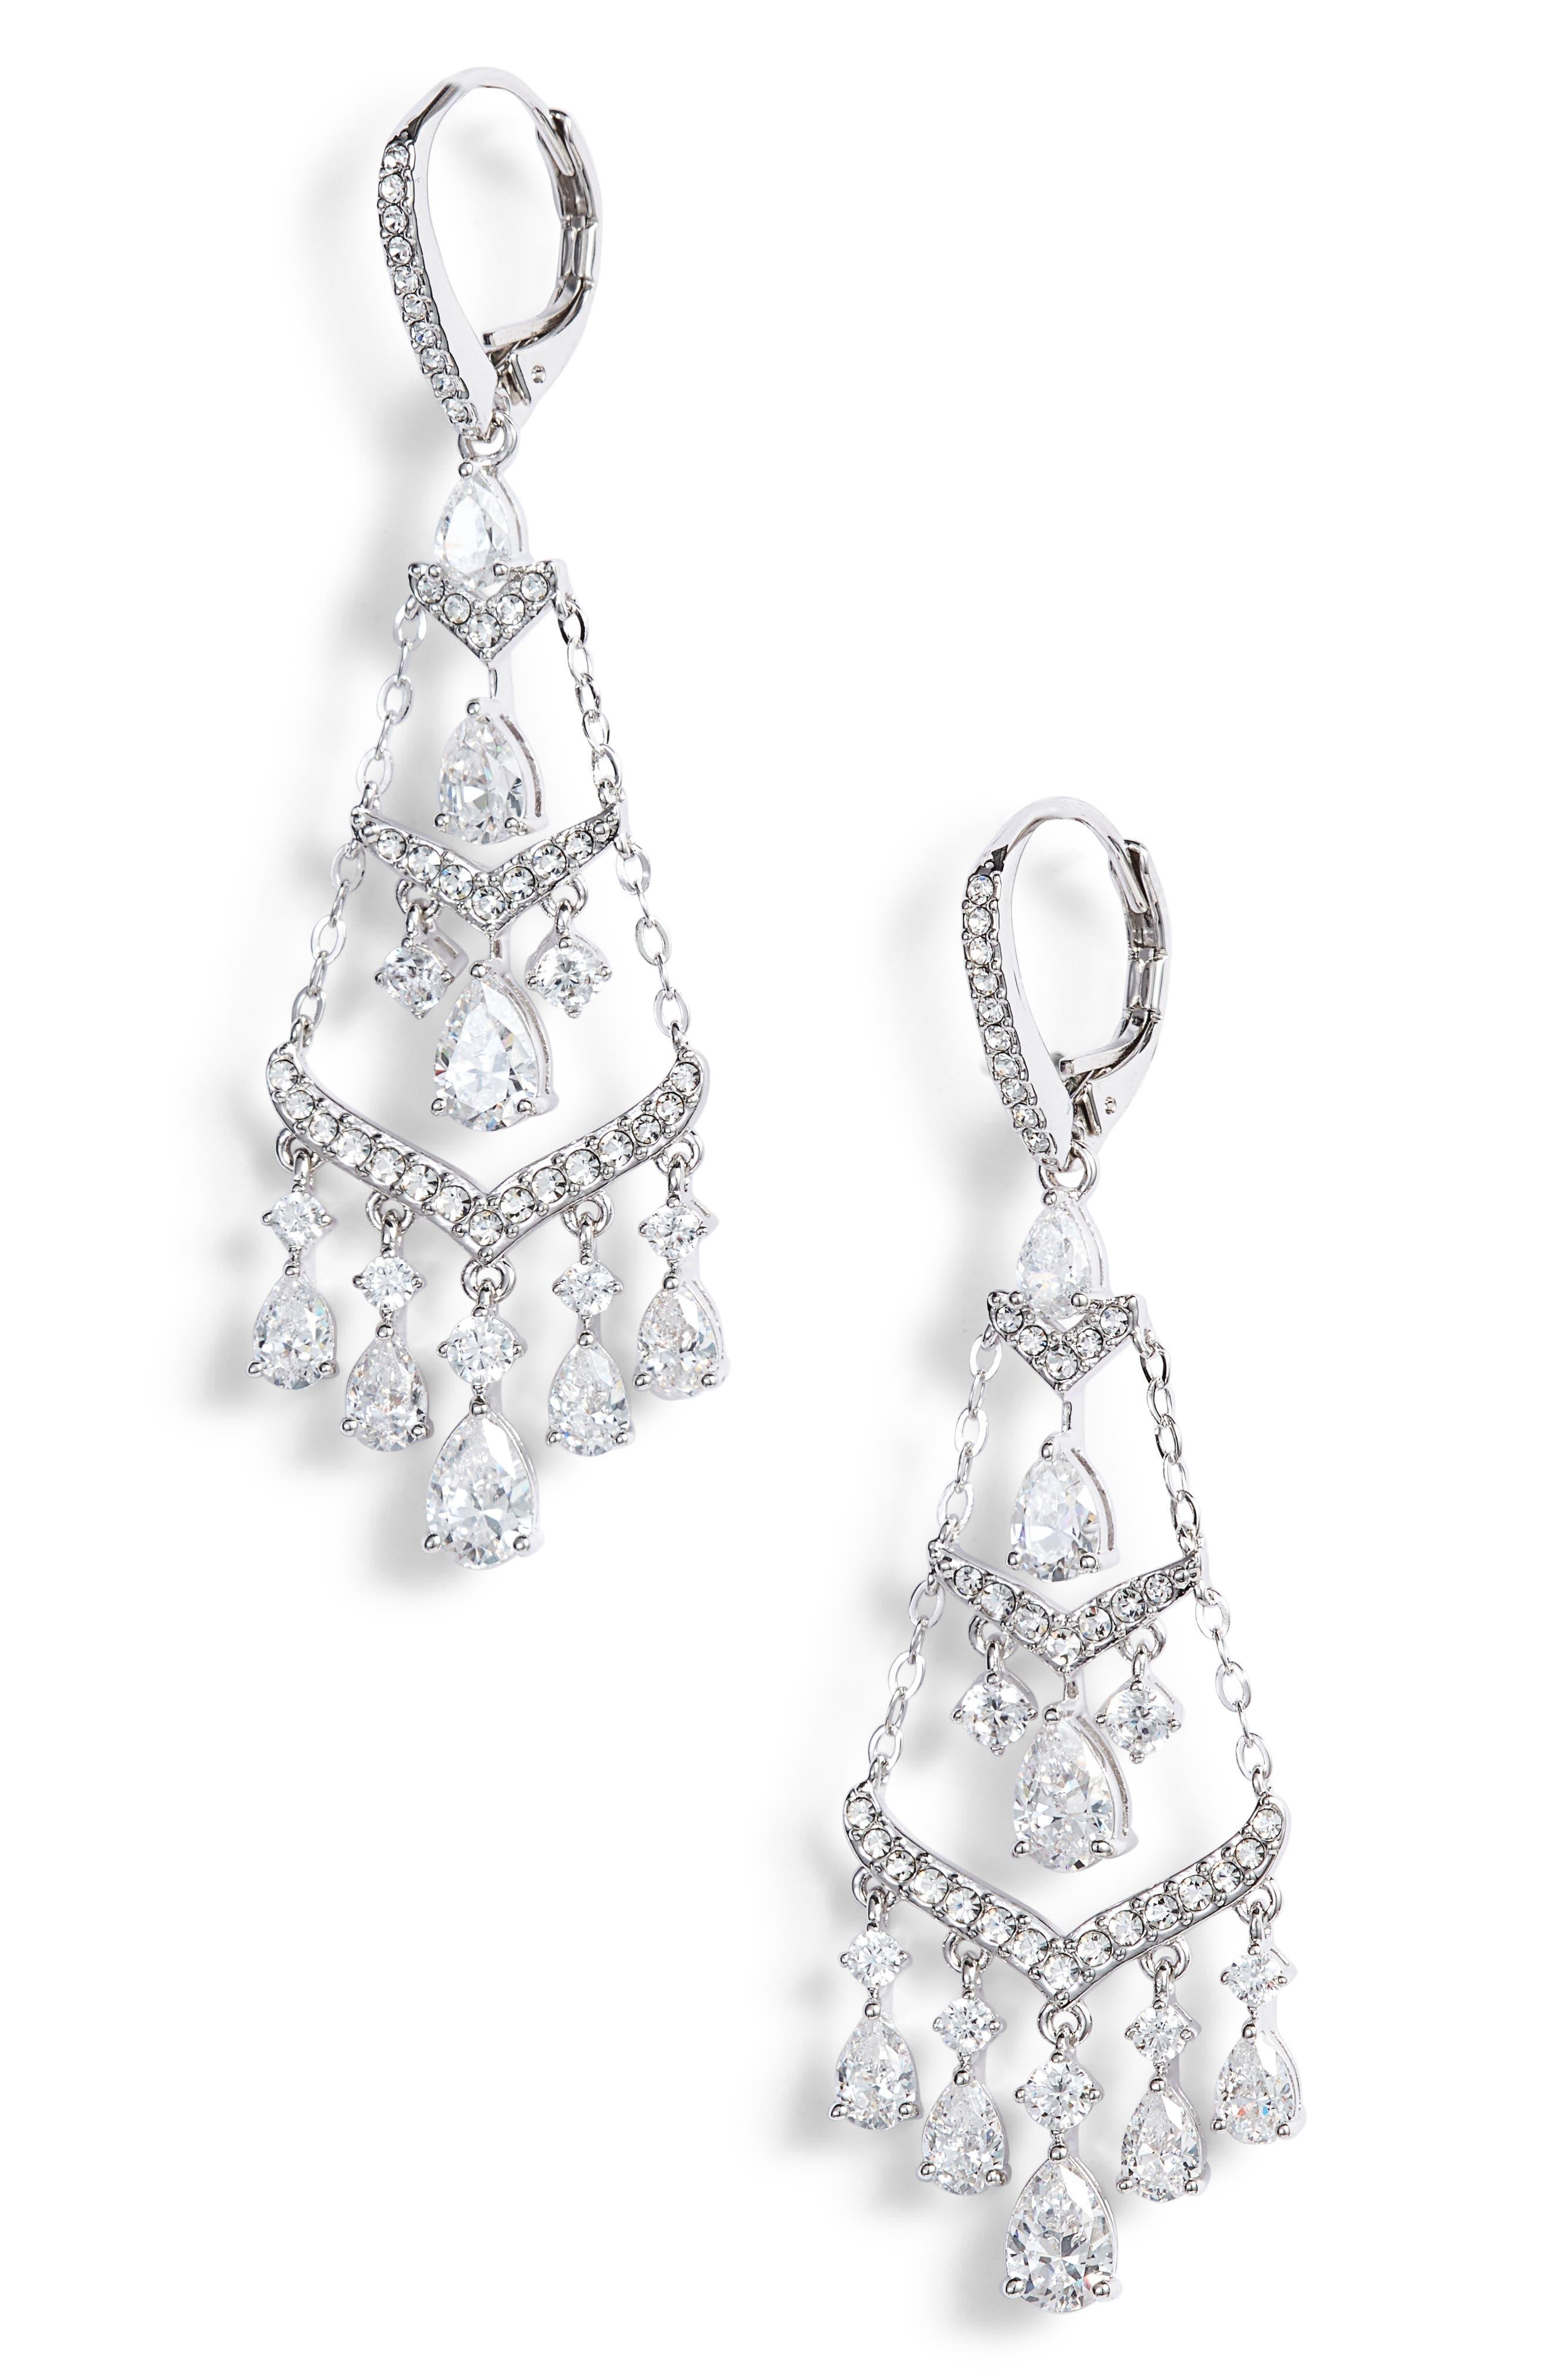 Chandelier Earrings,                             Main thumbnail 1, color,                             SILVER